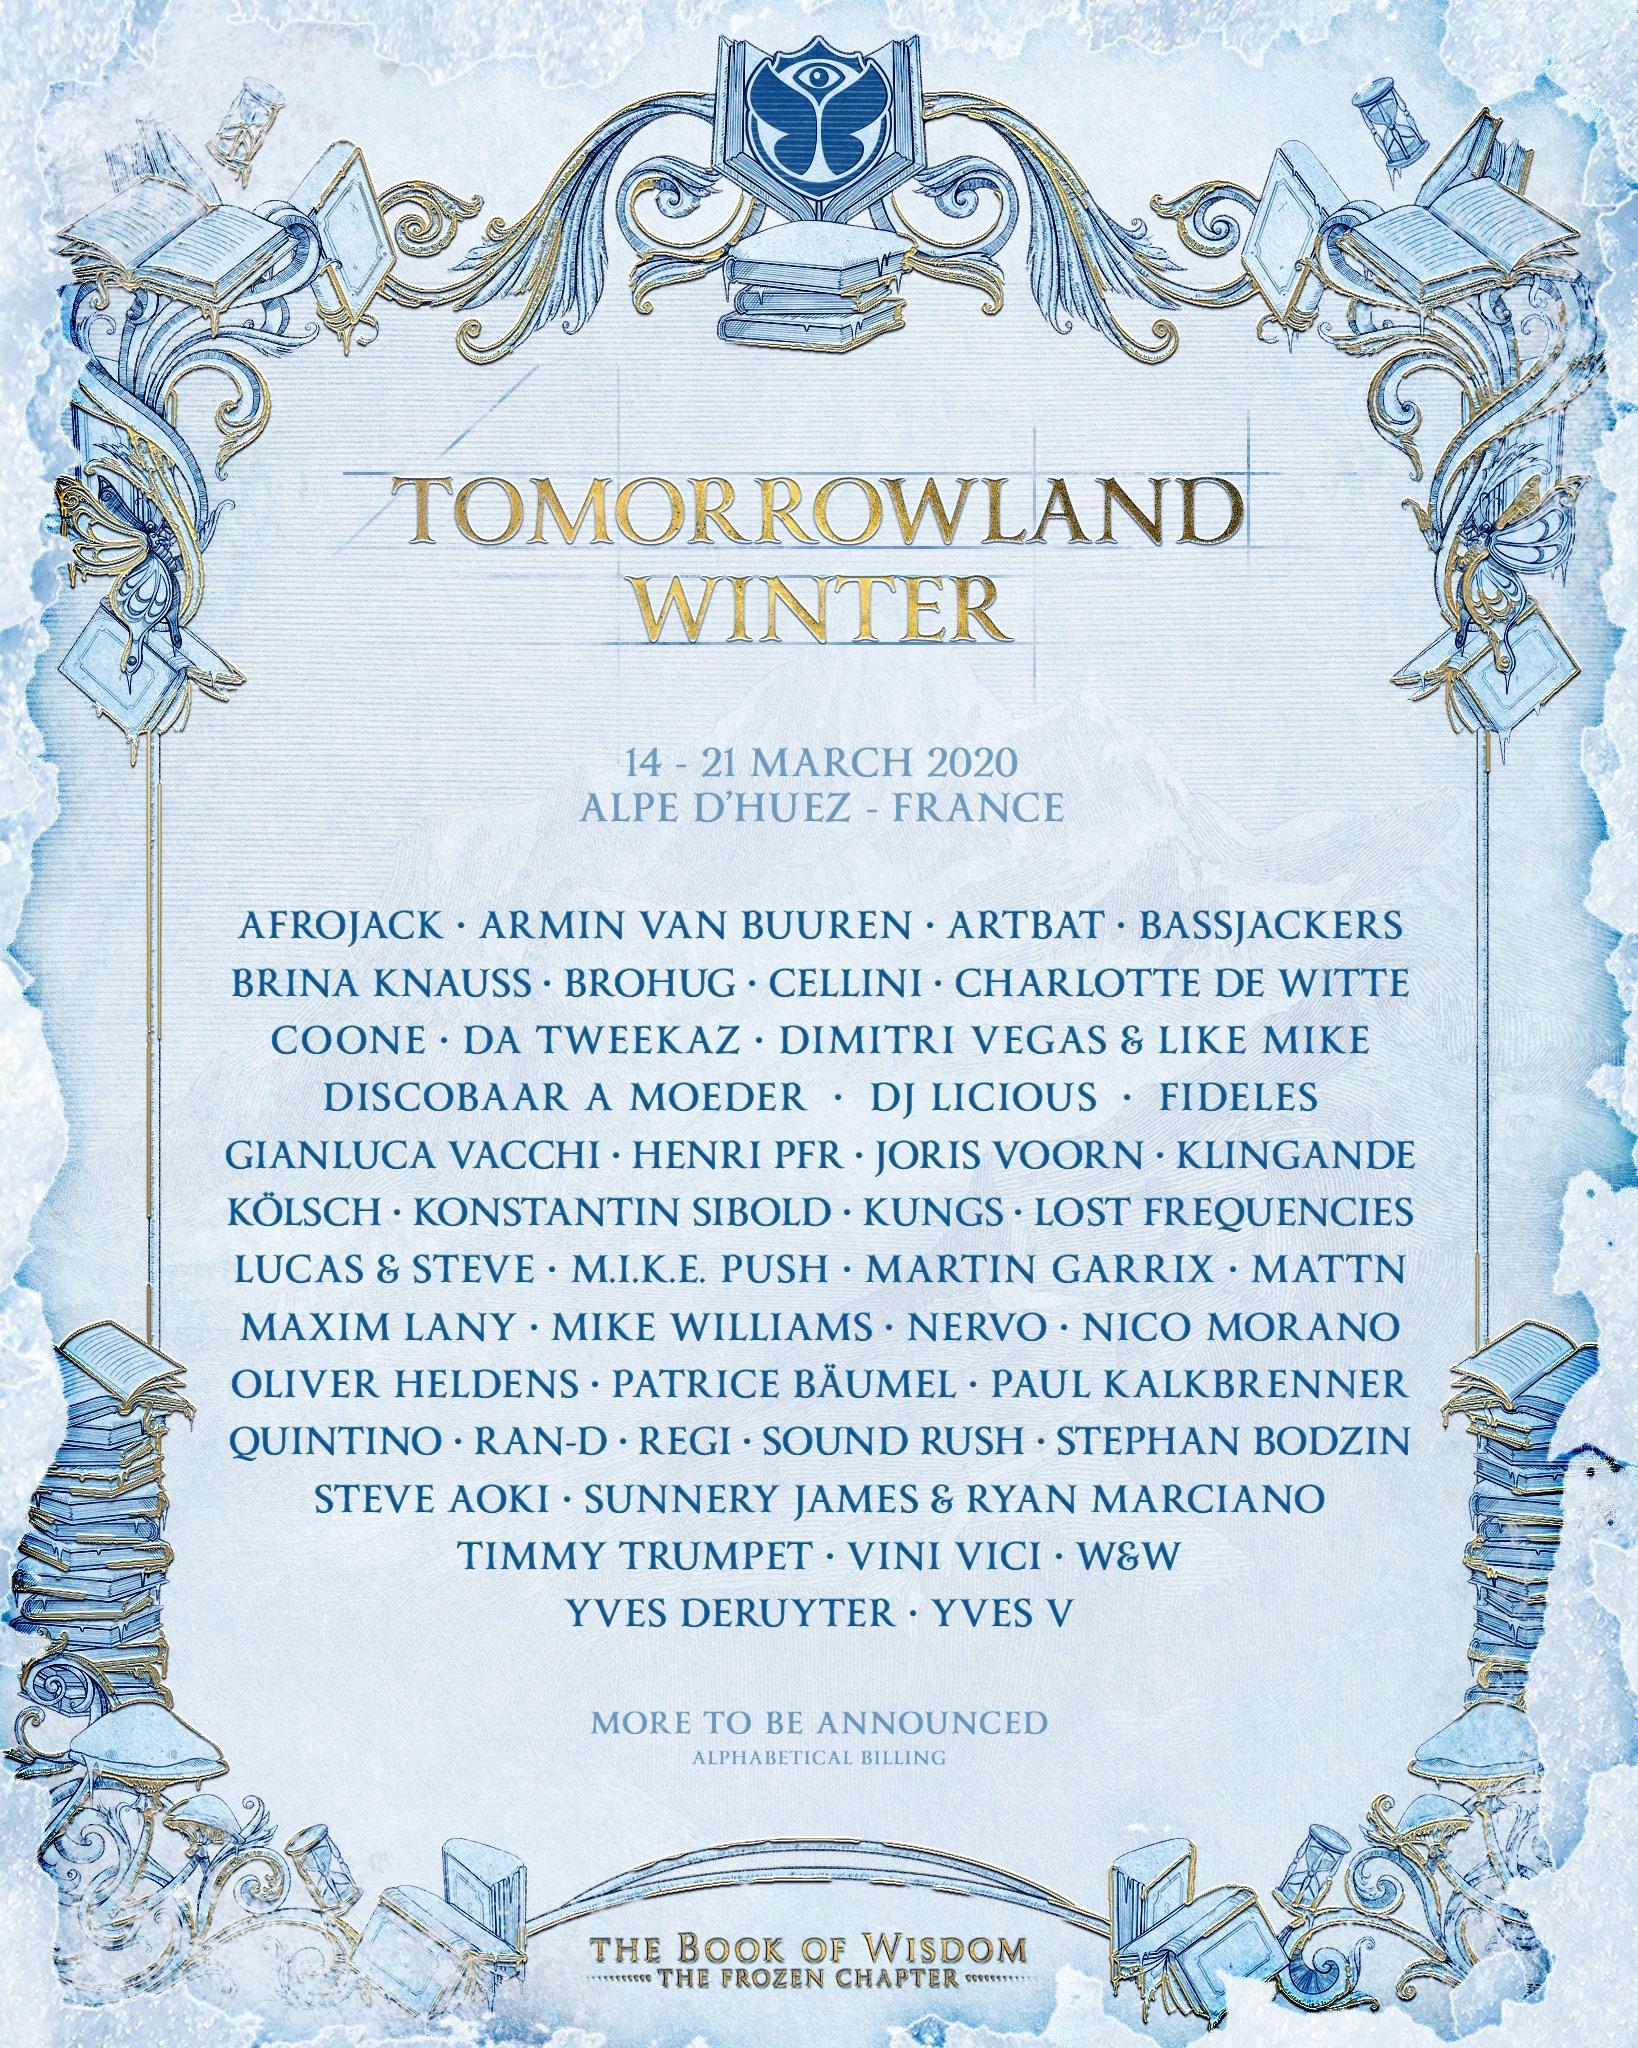 Tomorrowland Winter 2020 Lineup